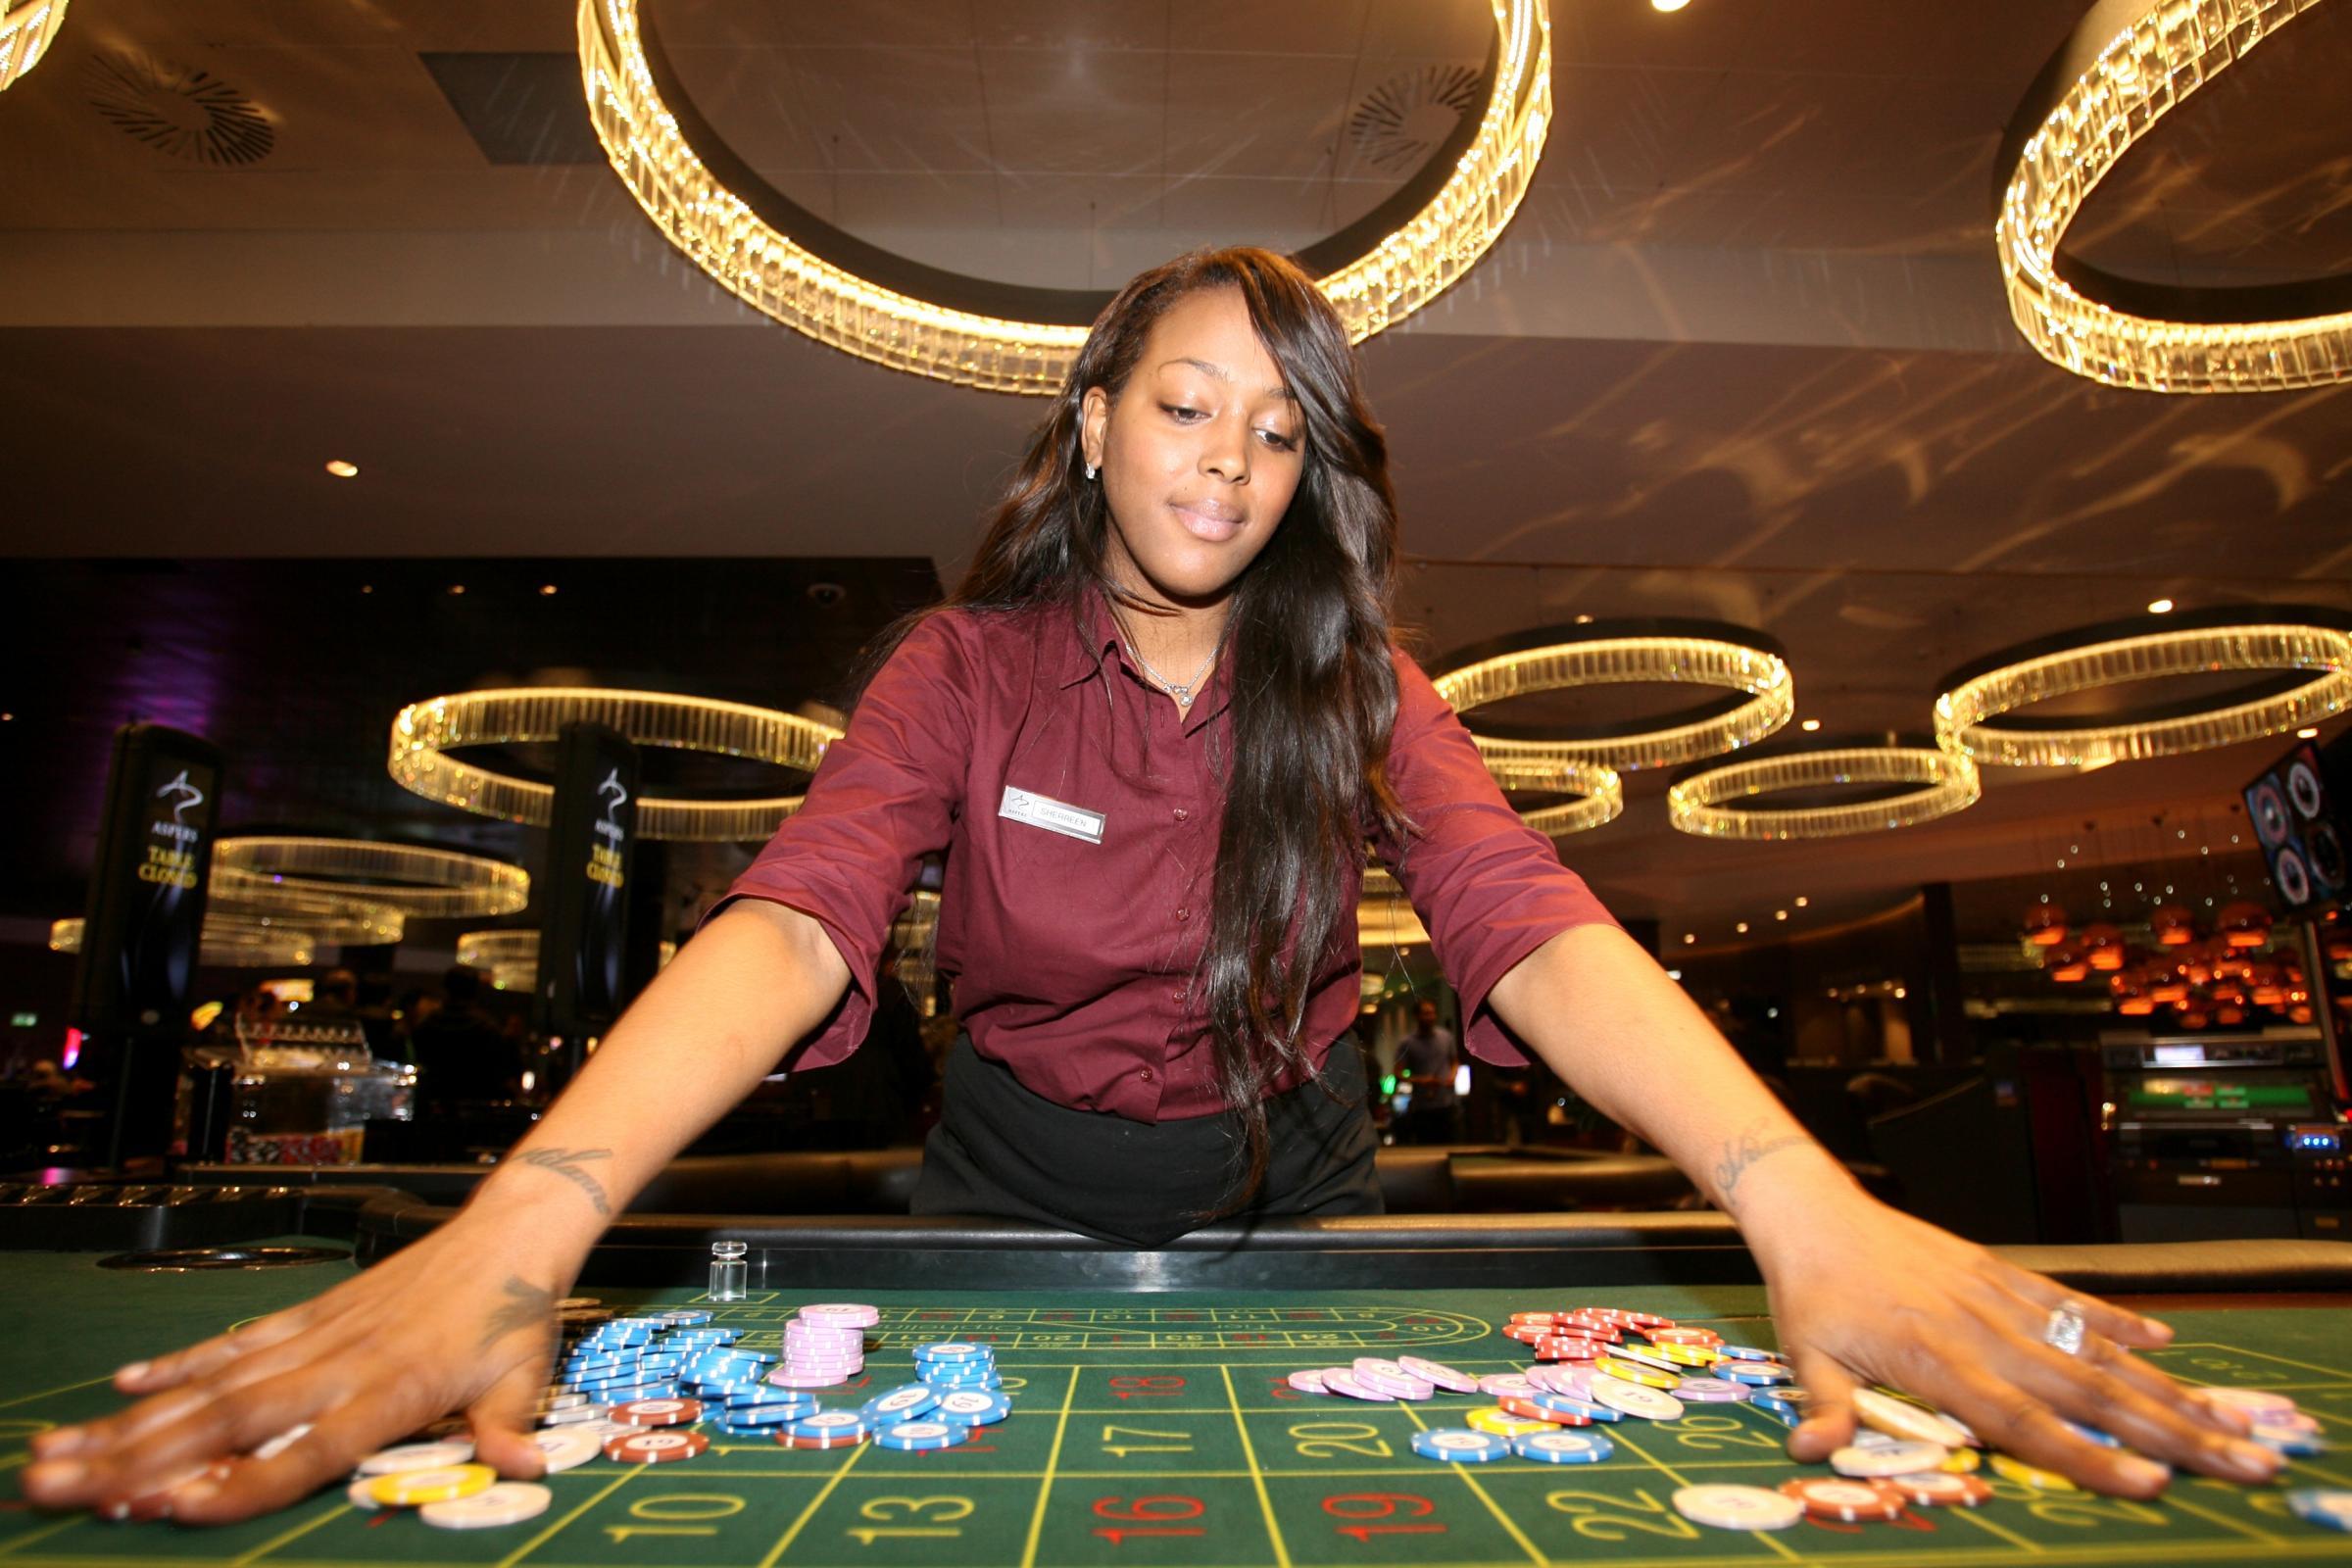 Crown casino croupier video slot machines online